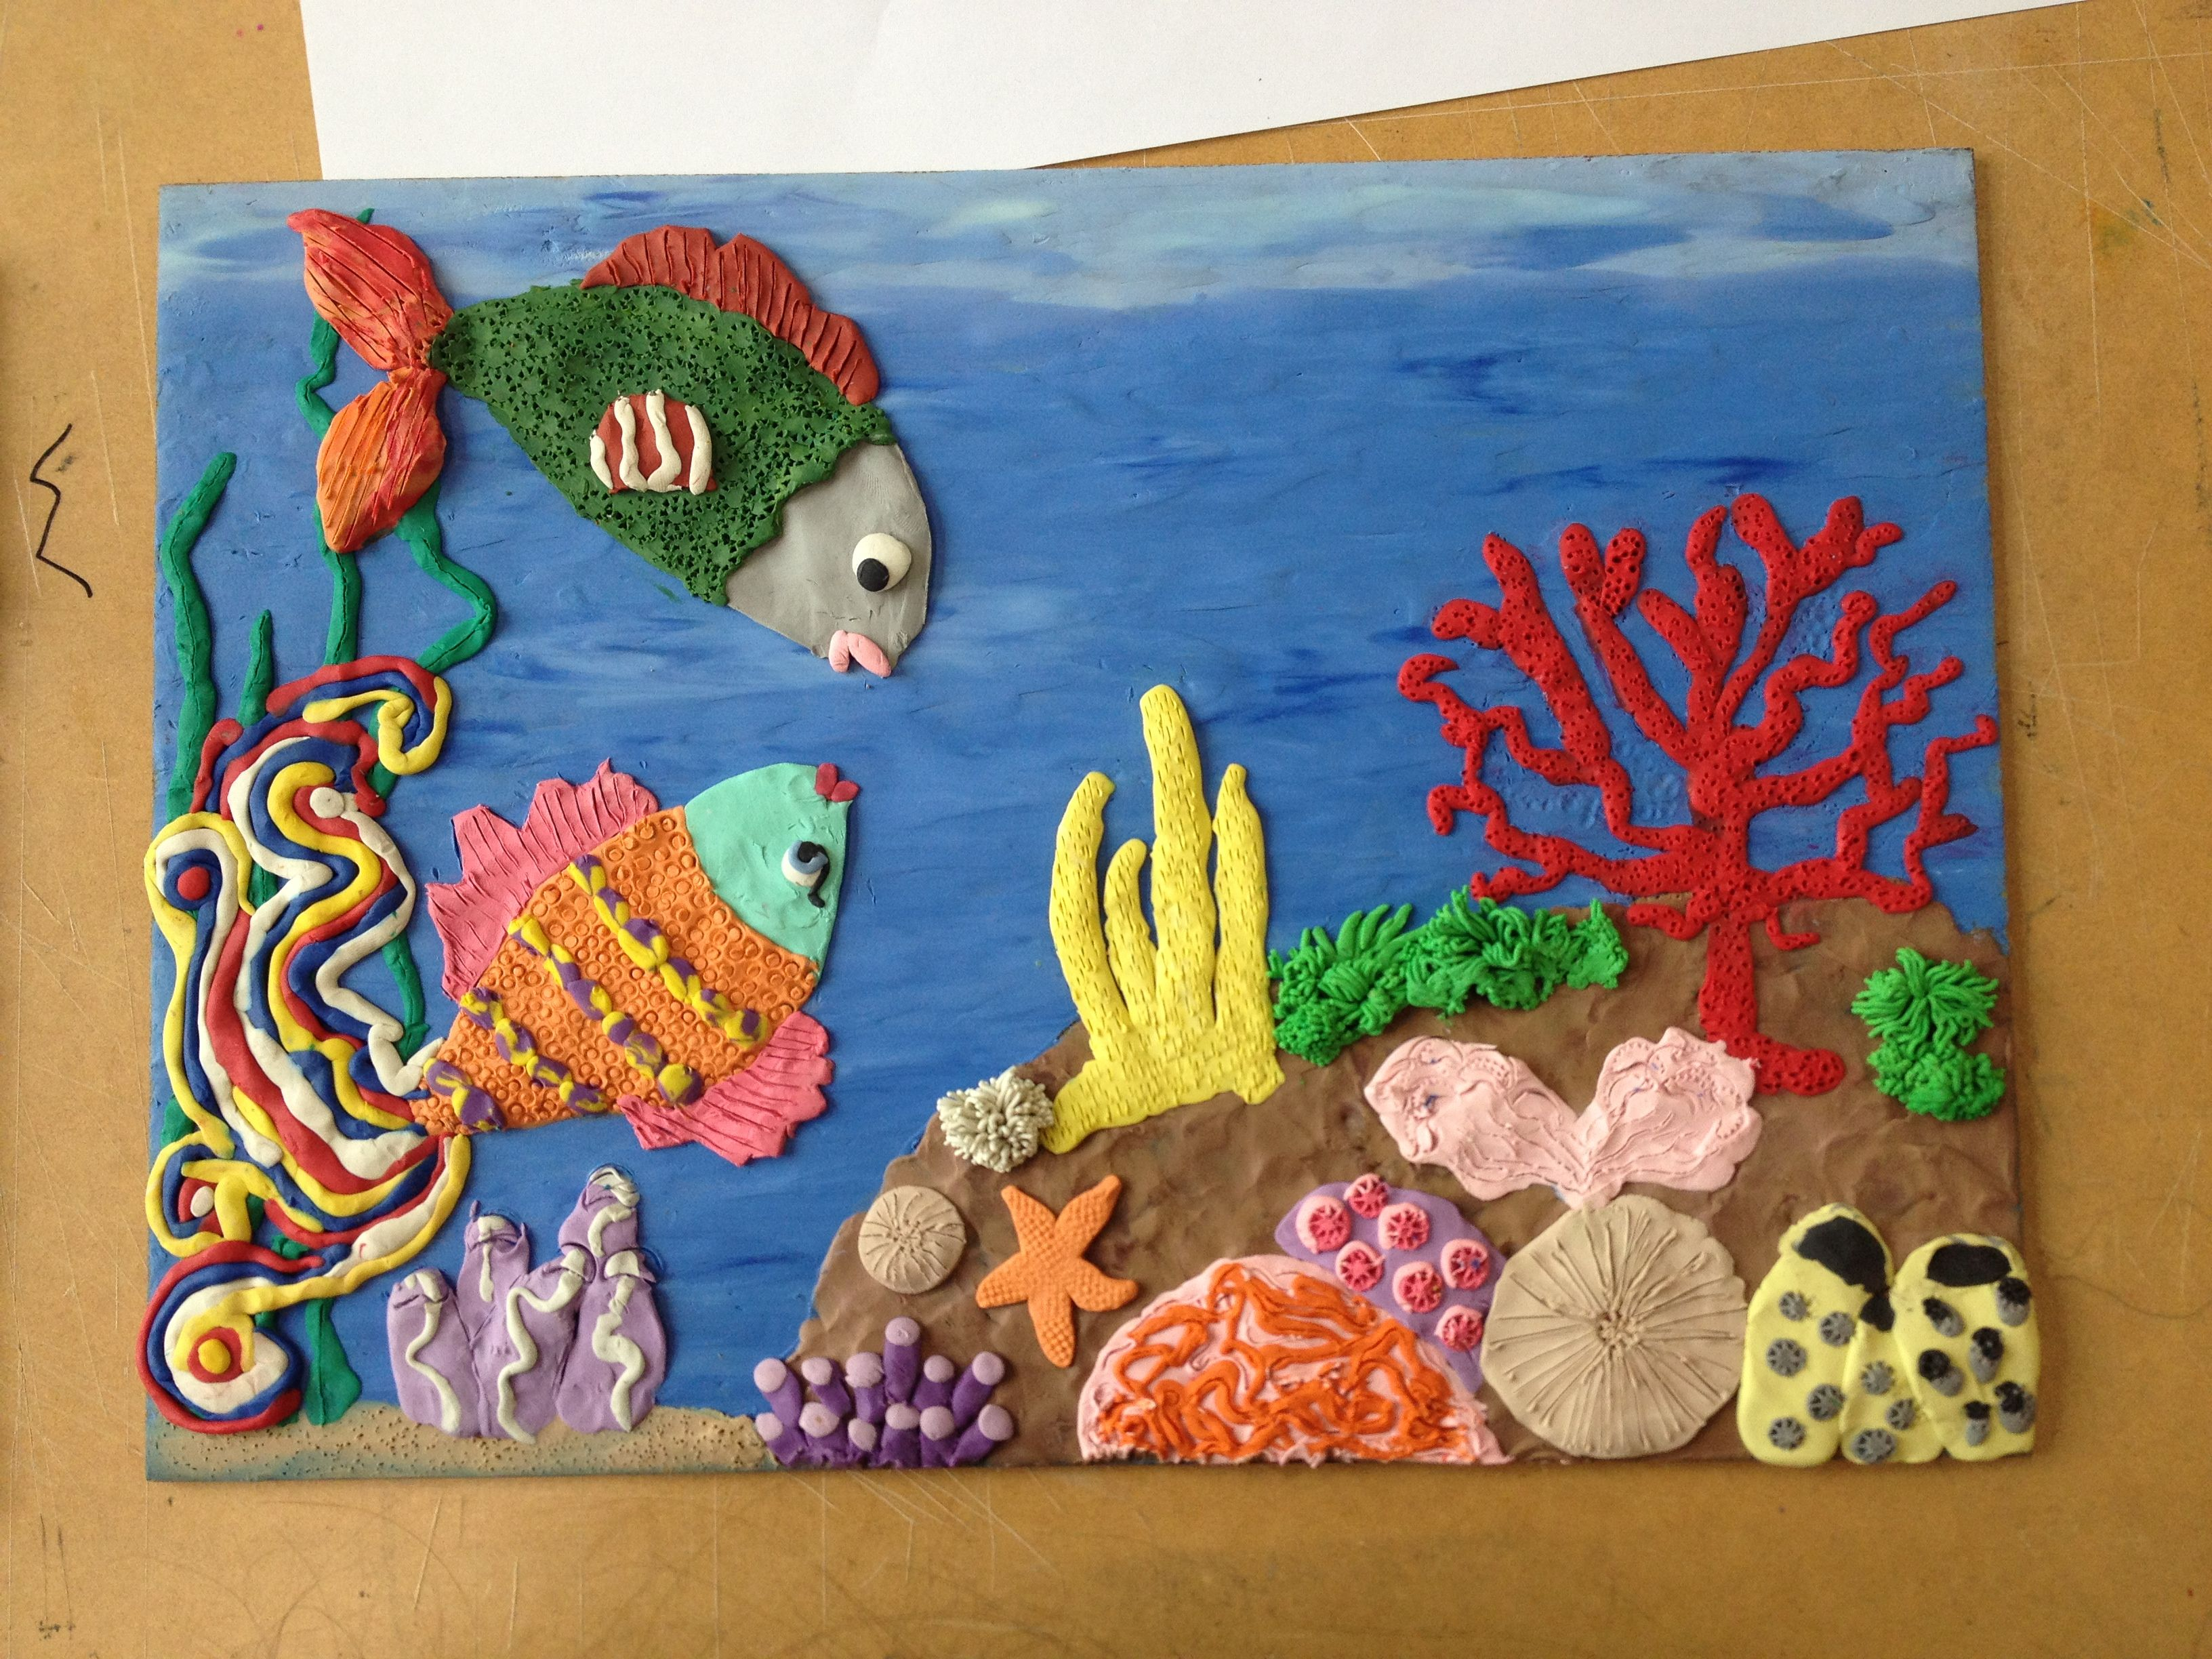 Plasticine Pictures: I Turned My School Hobby Into Art ...  Plasticine Sculpture